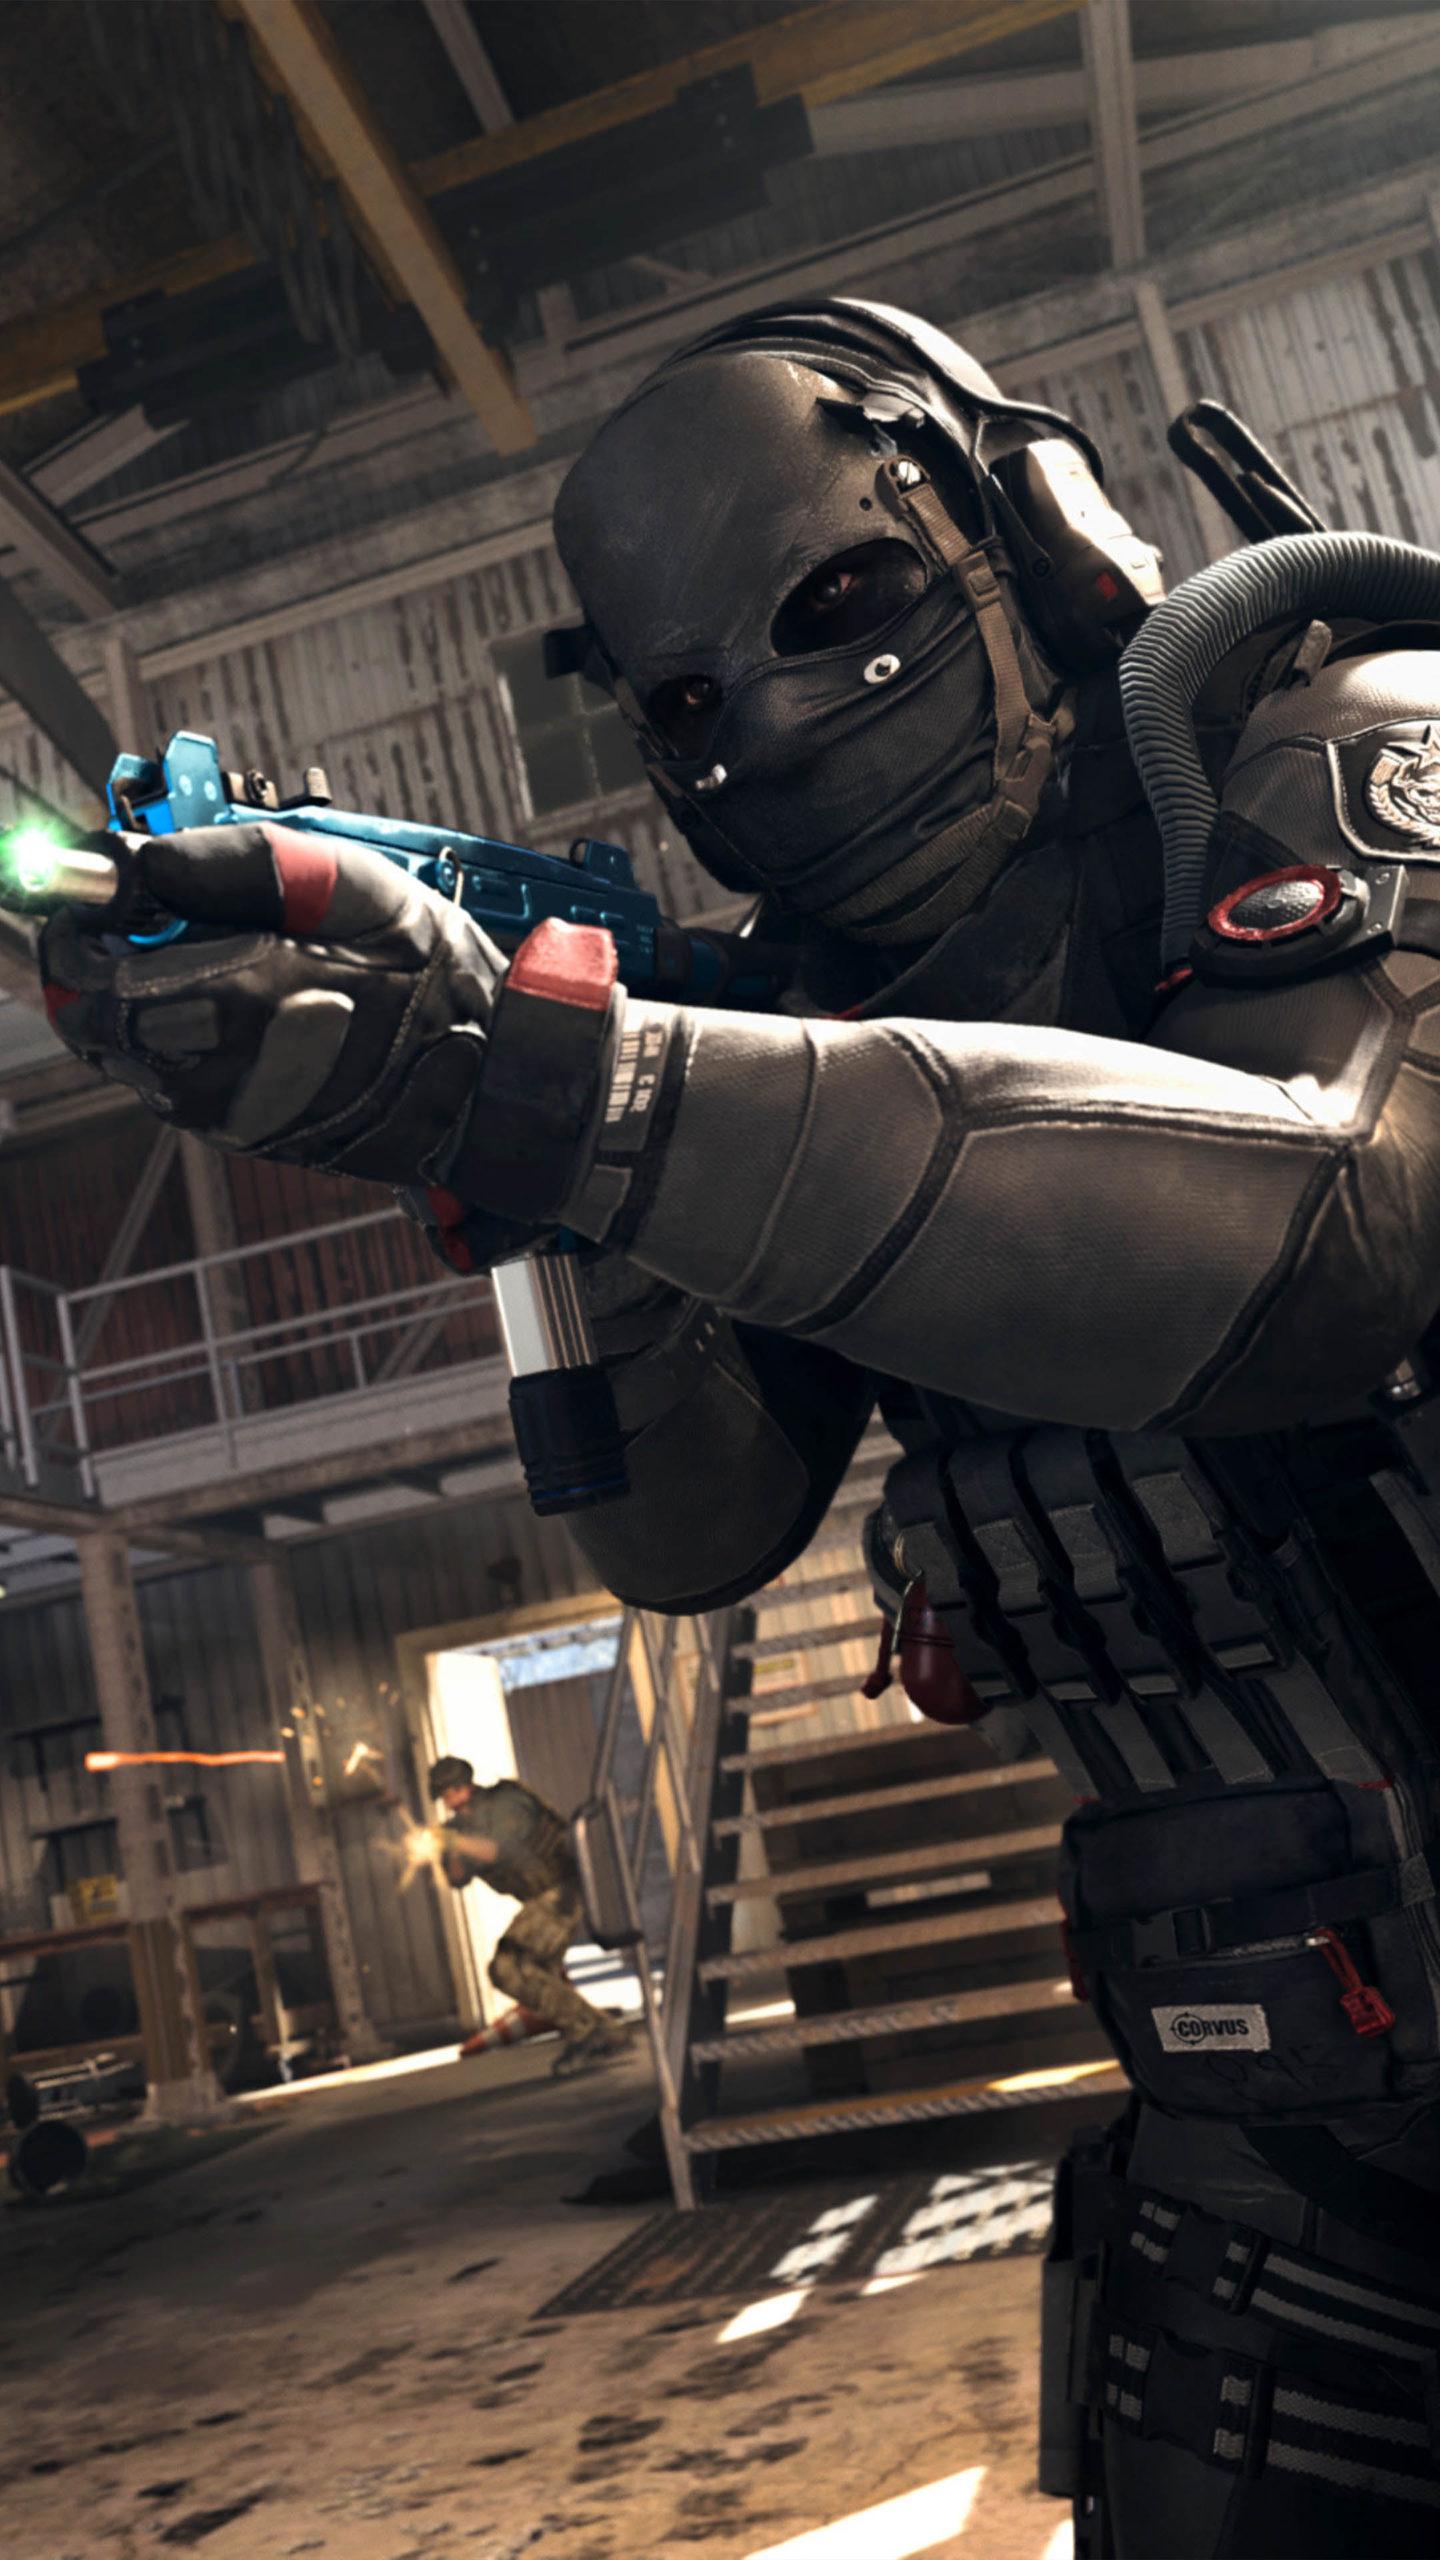 Maskman Call Of Duty Modern Warfare 2020 4k Ultra Hd Mobile Wallpaper